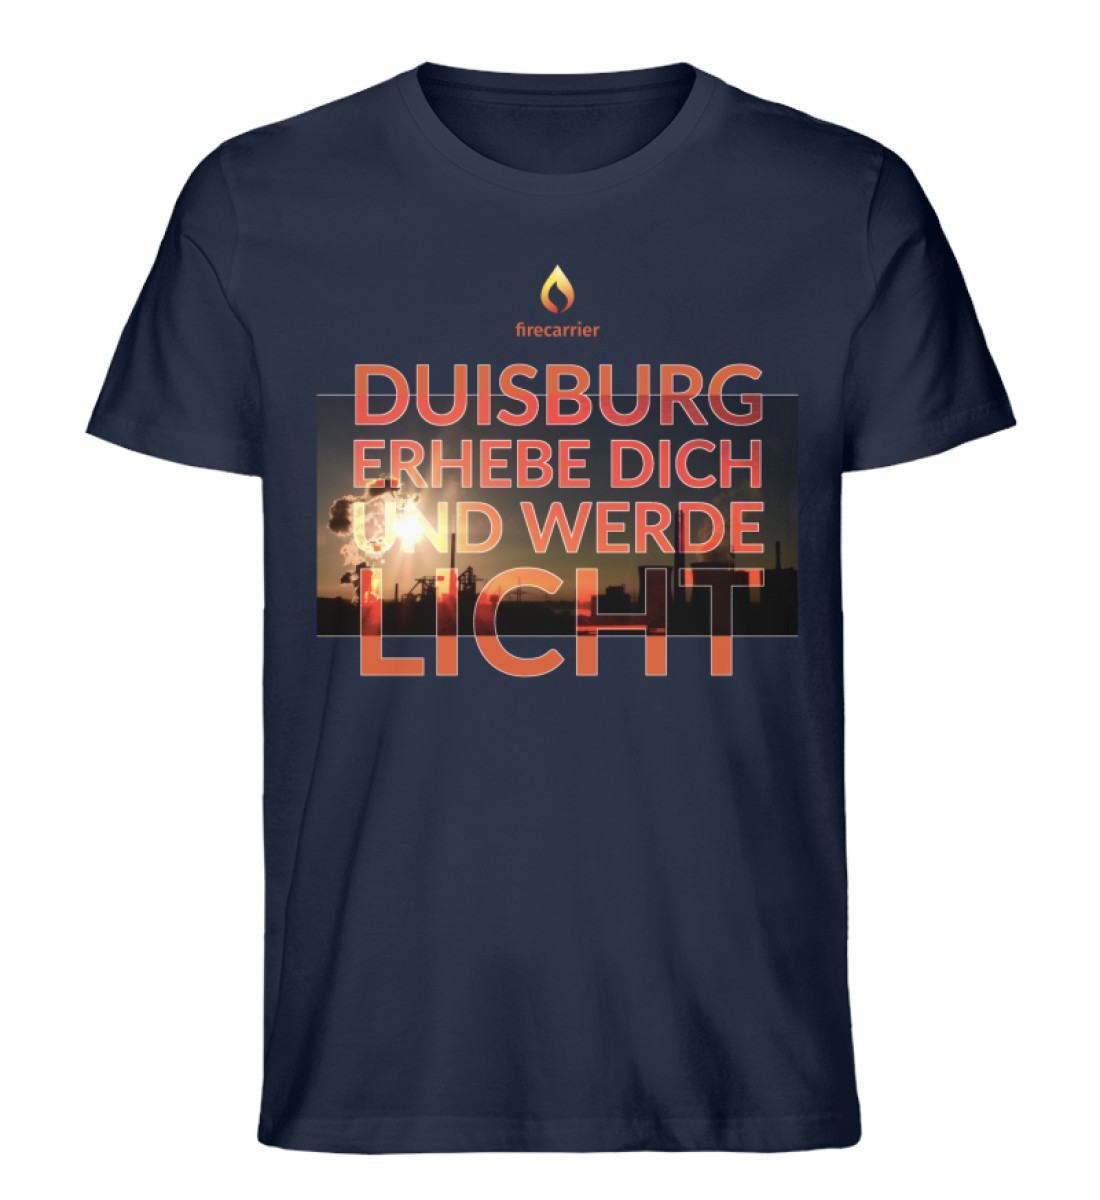 duisburg - Herren Premium Organic Shirt-6959